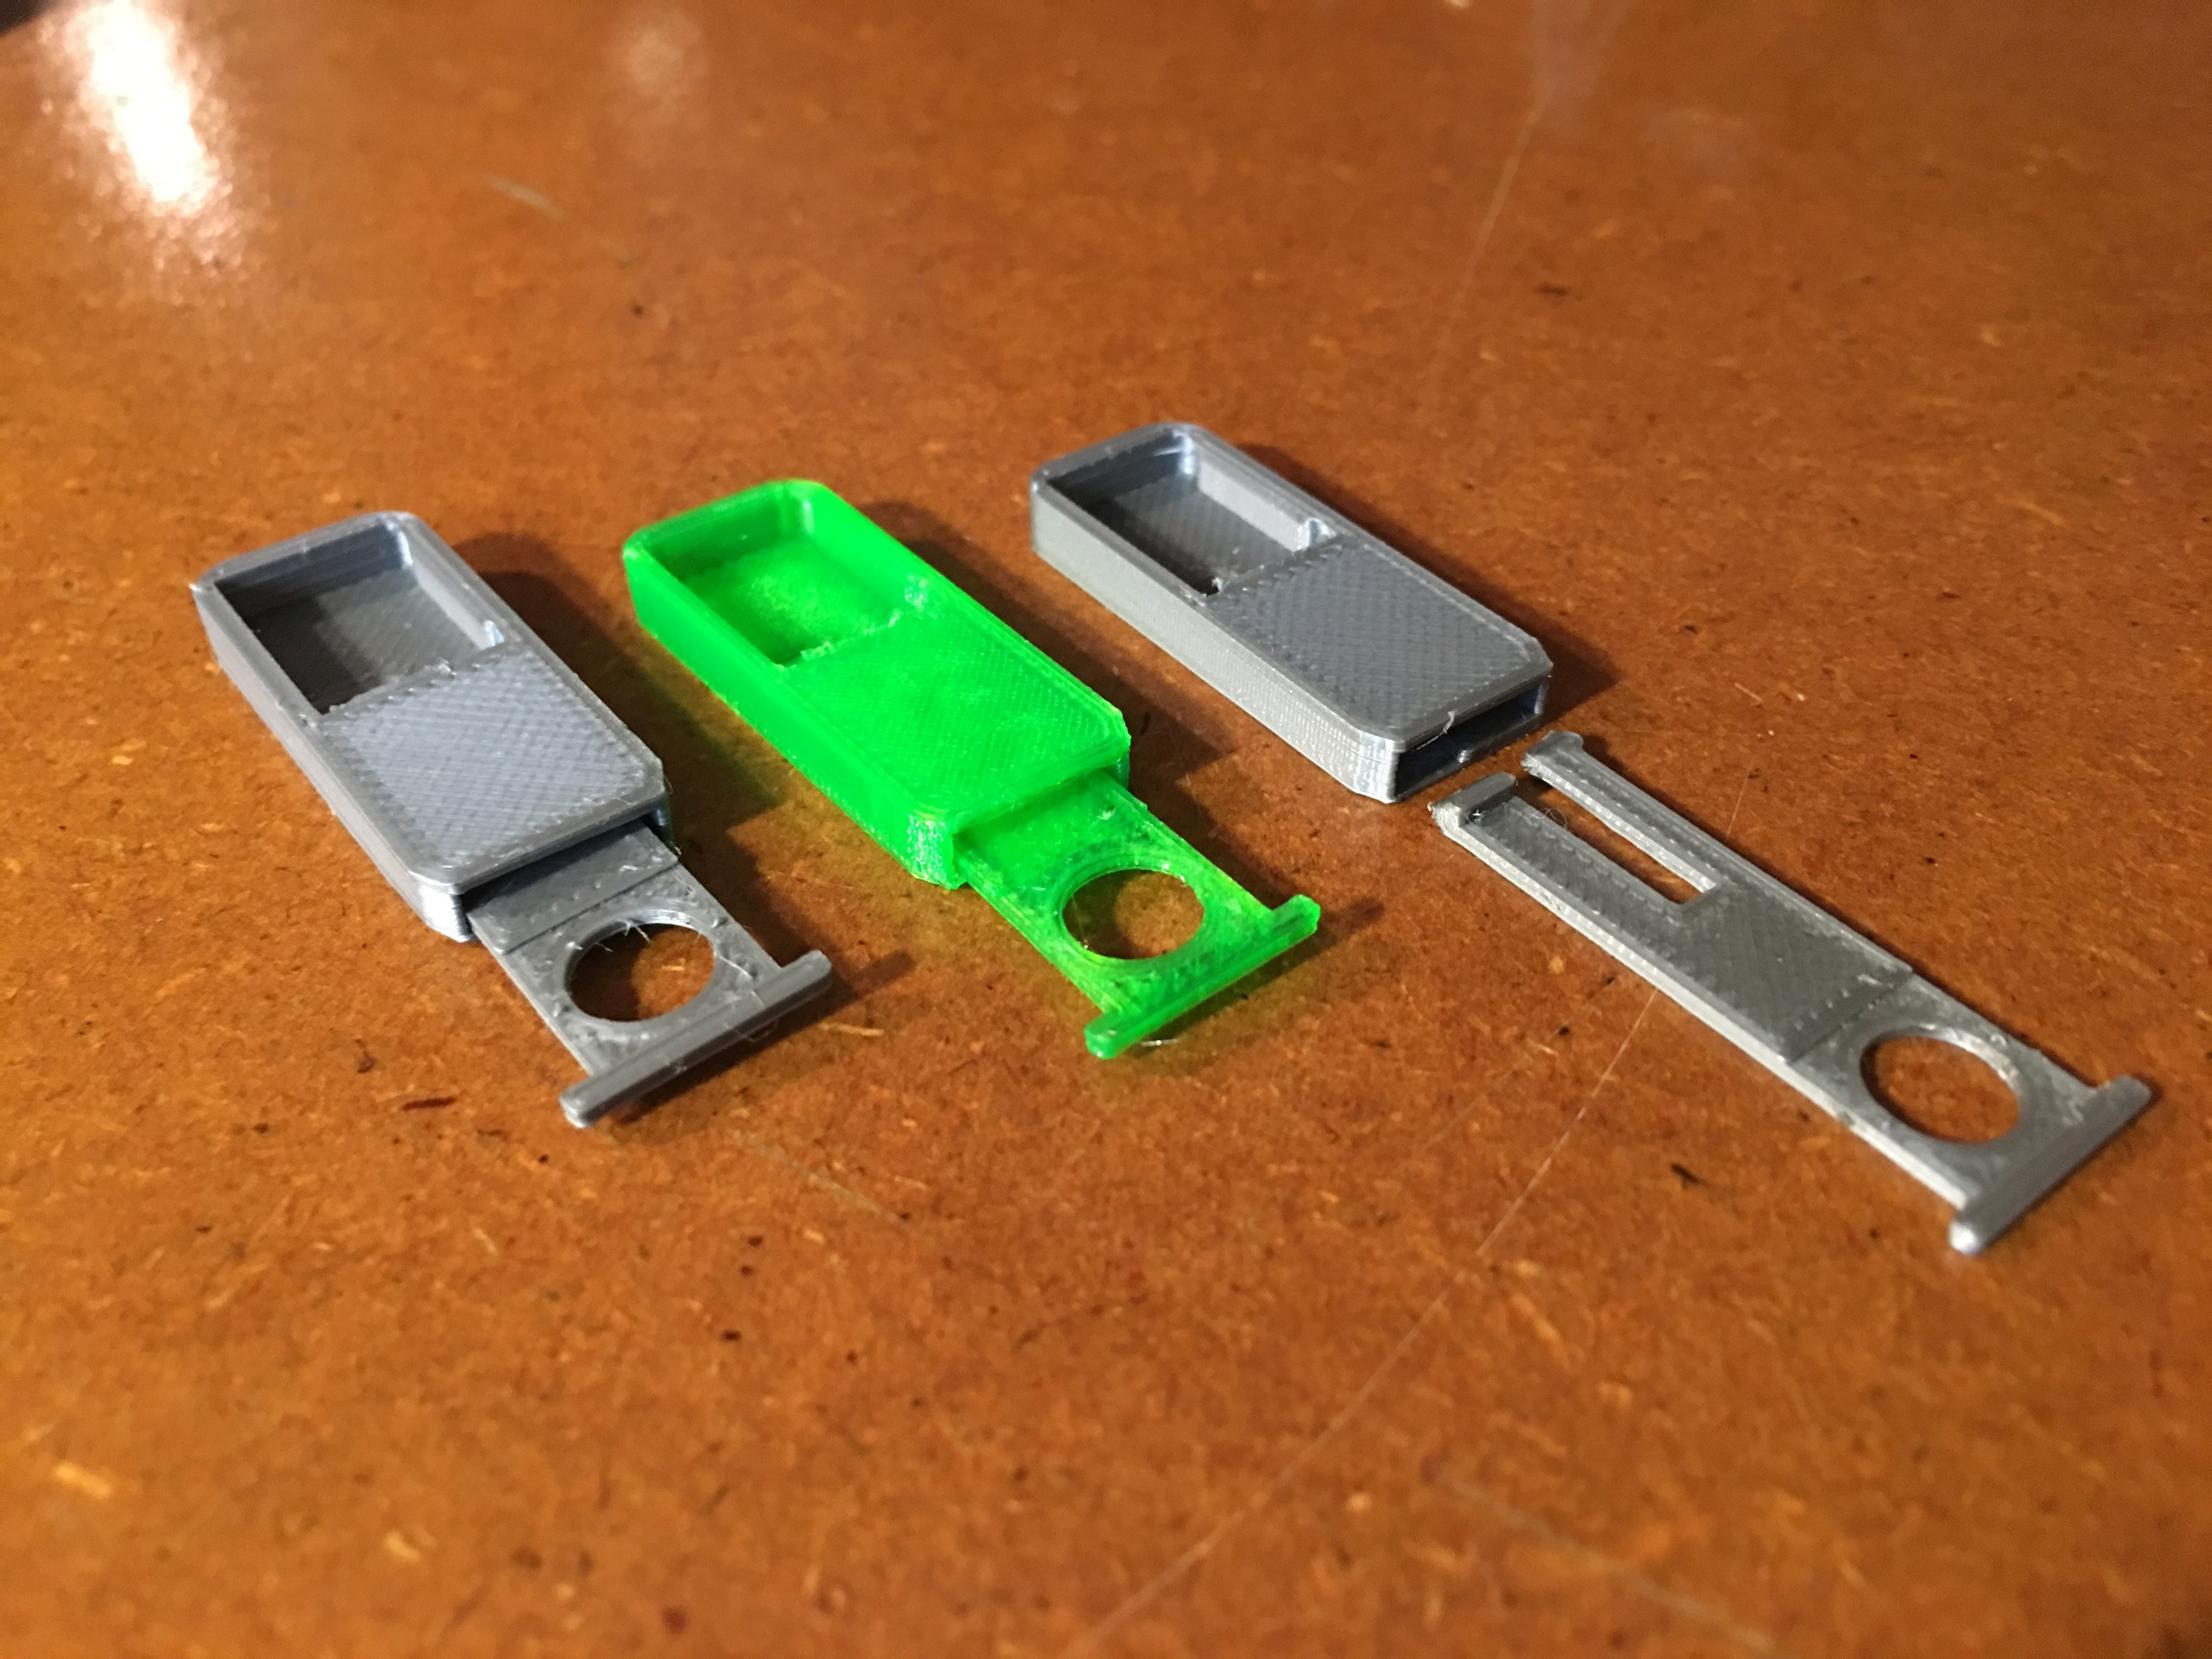 9EEEEB20-6FA6-4B13-A00A-472ECBCEF875.jpeg Download free STL file Network Bonnet • 3D printing template, tupa